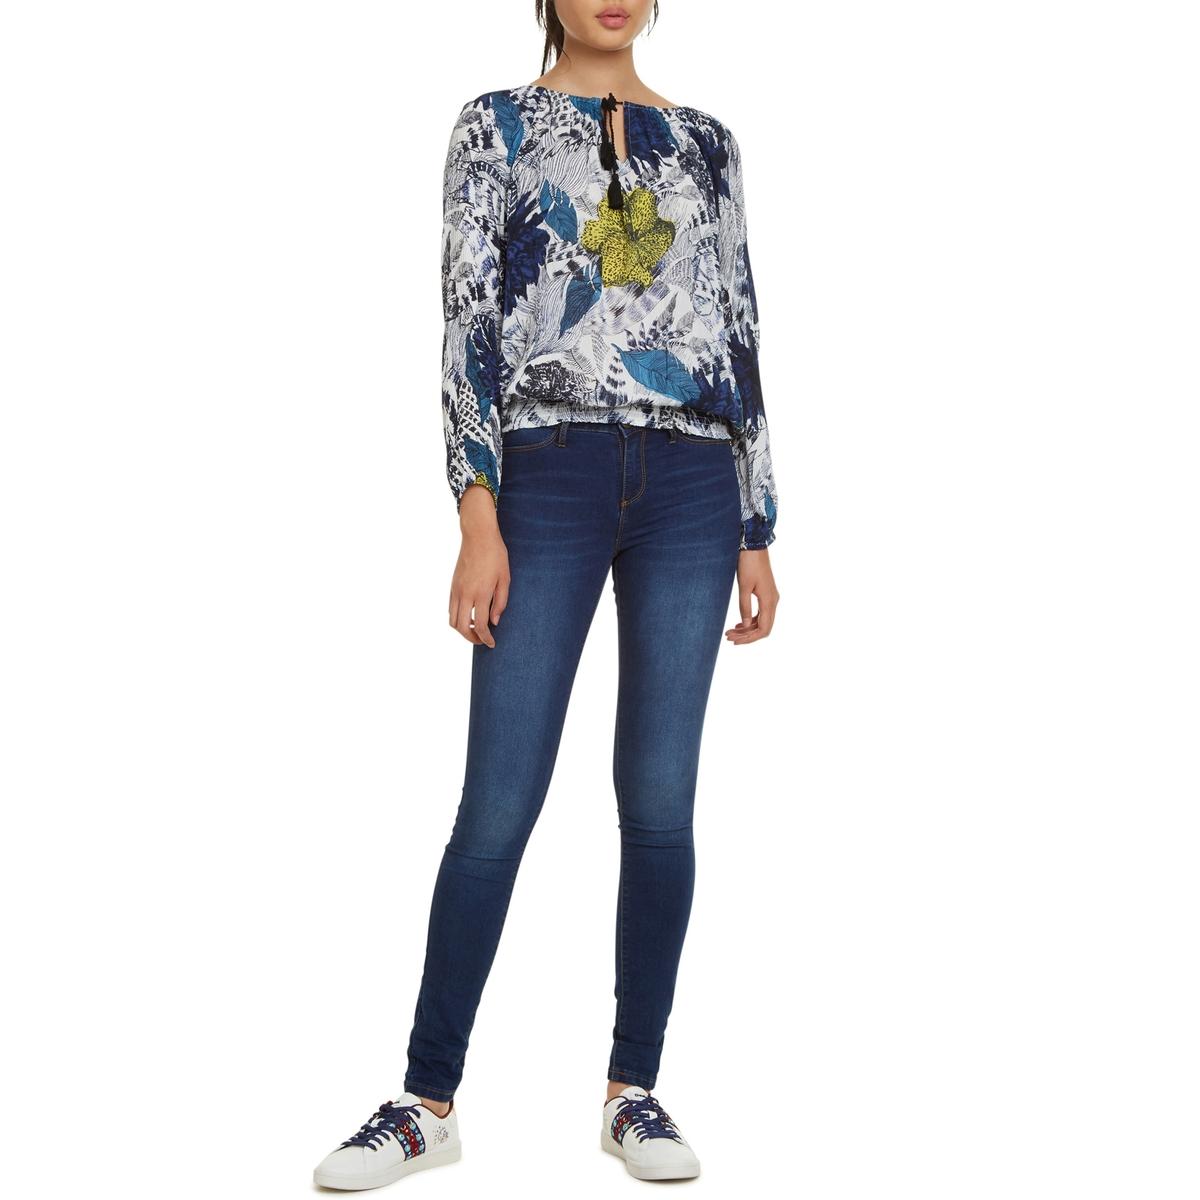 Blusa Amandine vaporosa con estampado de flores